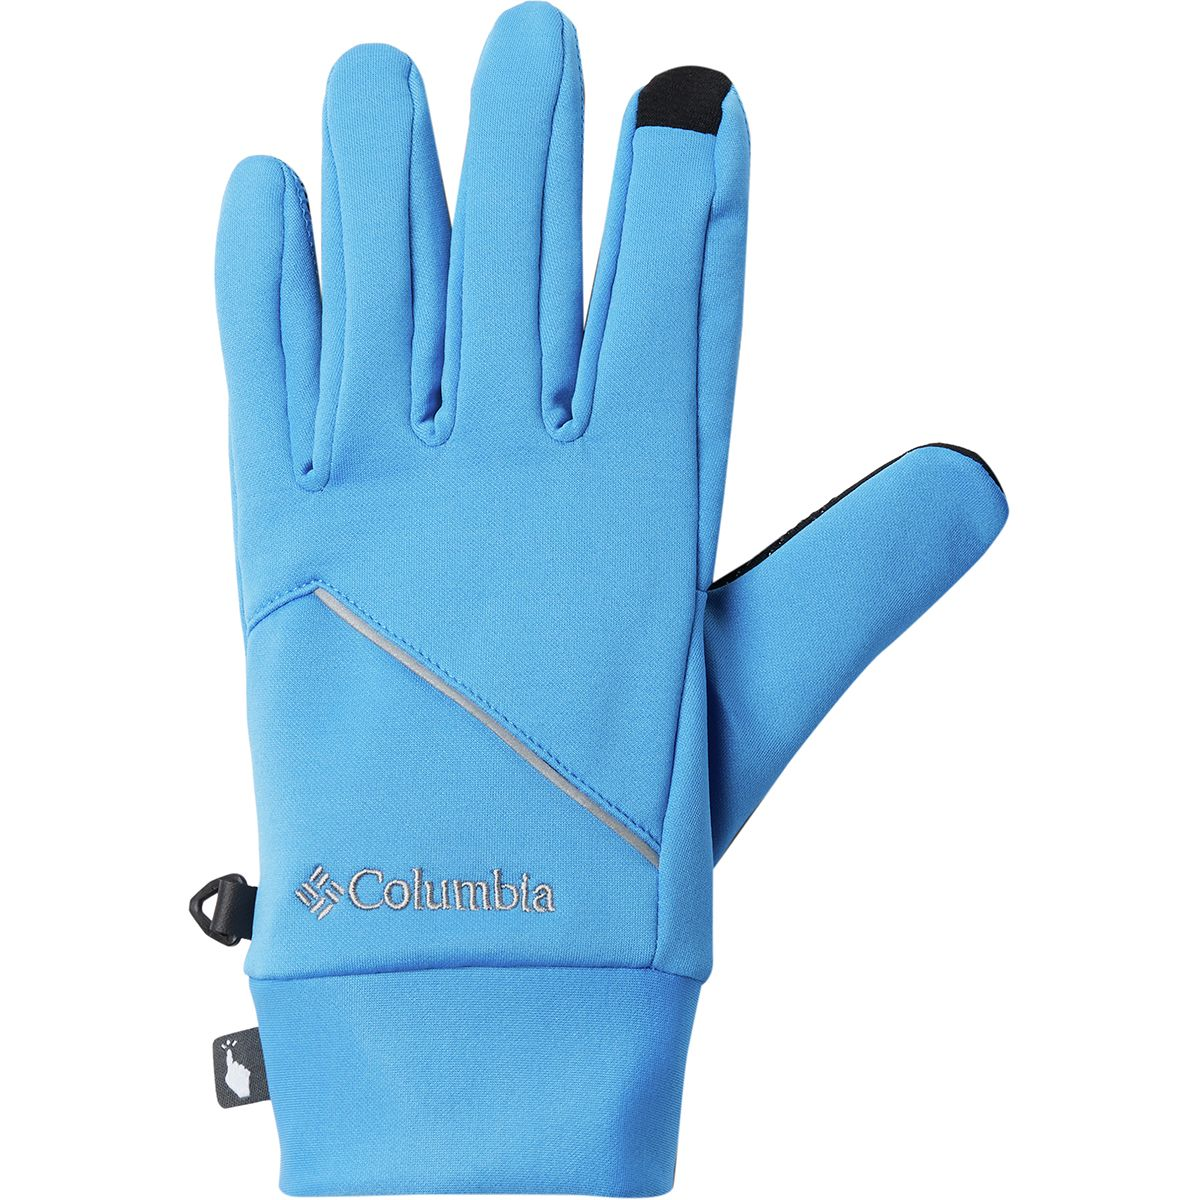 Columbia Trail Summit Running Glove